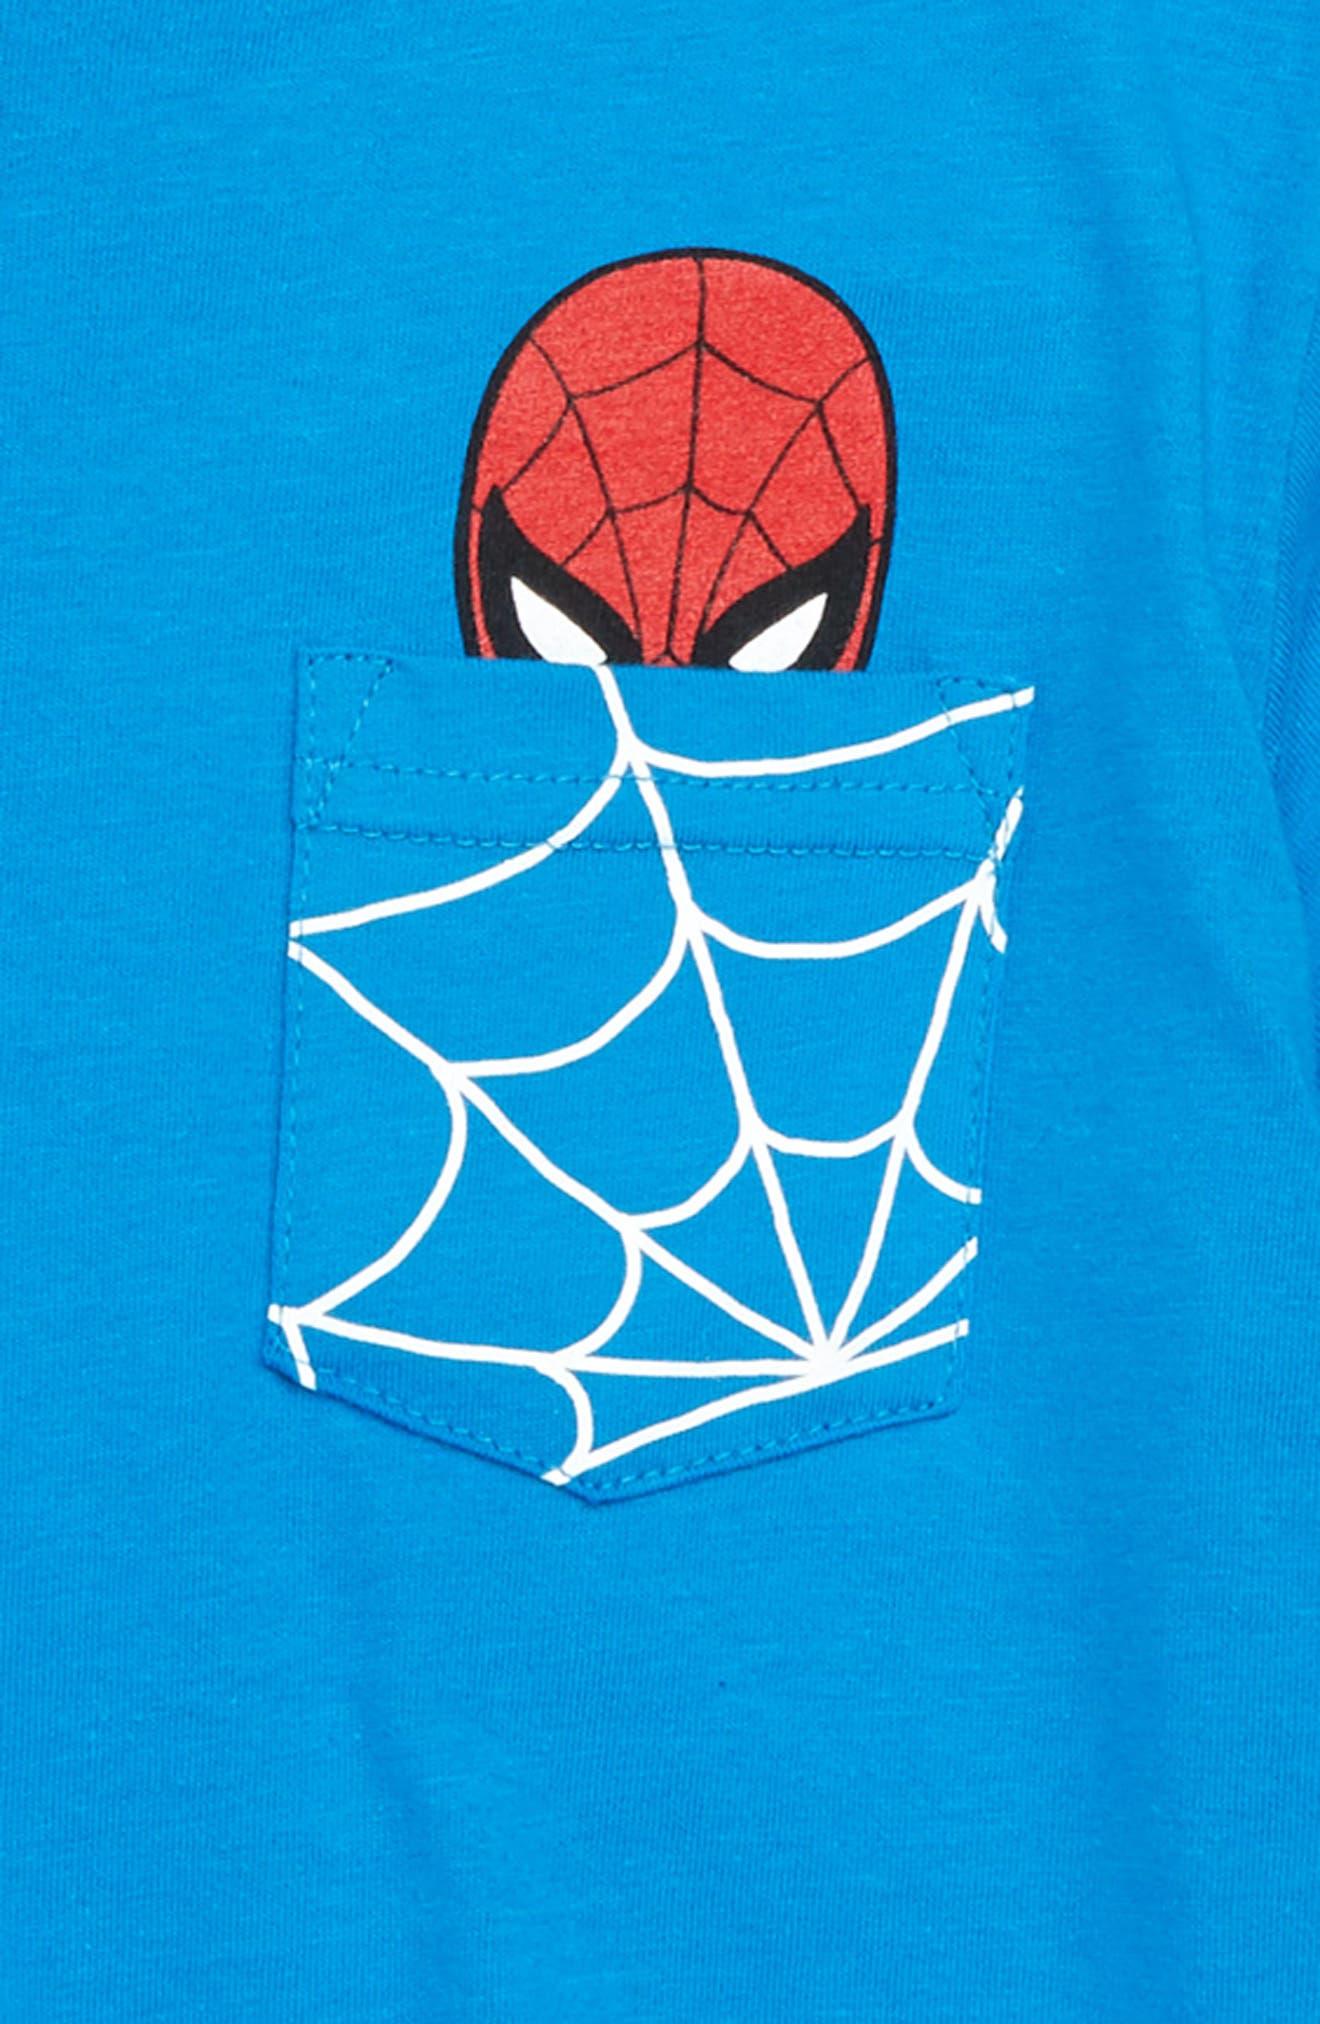 x Marvel<sup>®</sup> Avengers Spider-Man<sup>™</sup> Pocket T-Shirt,                             Alternate thumbnail 3, color,                             420